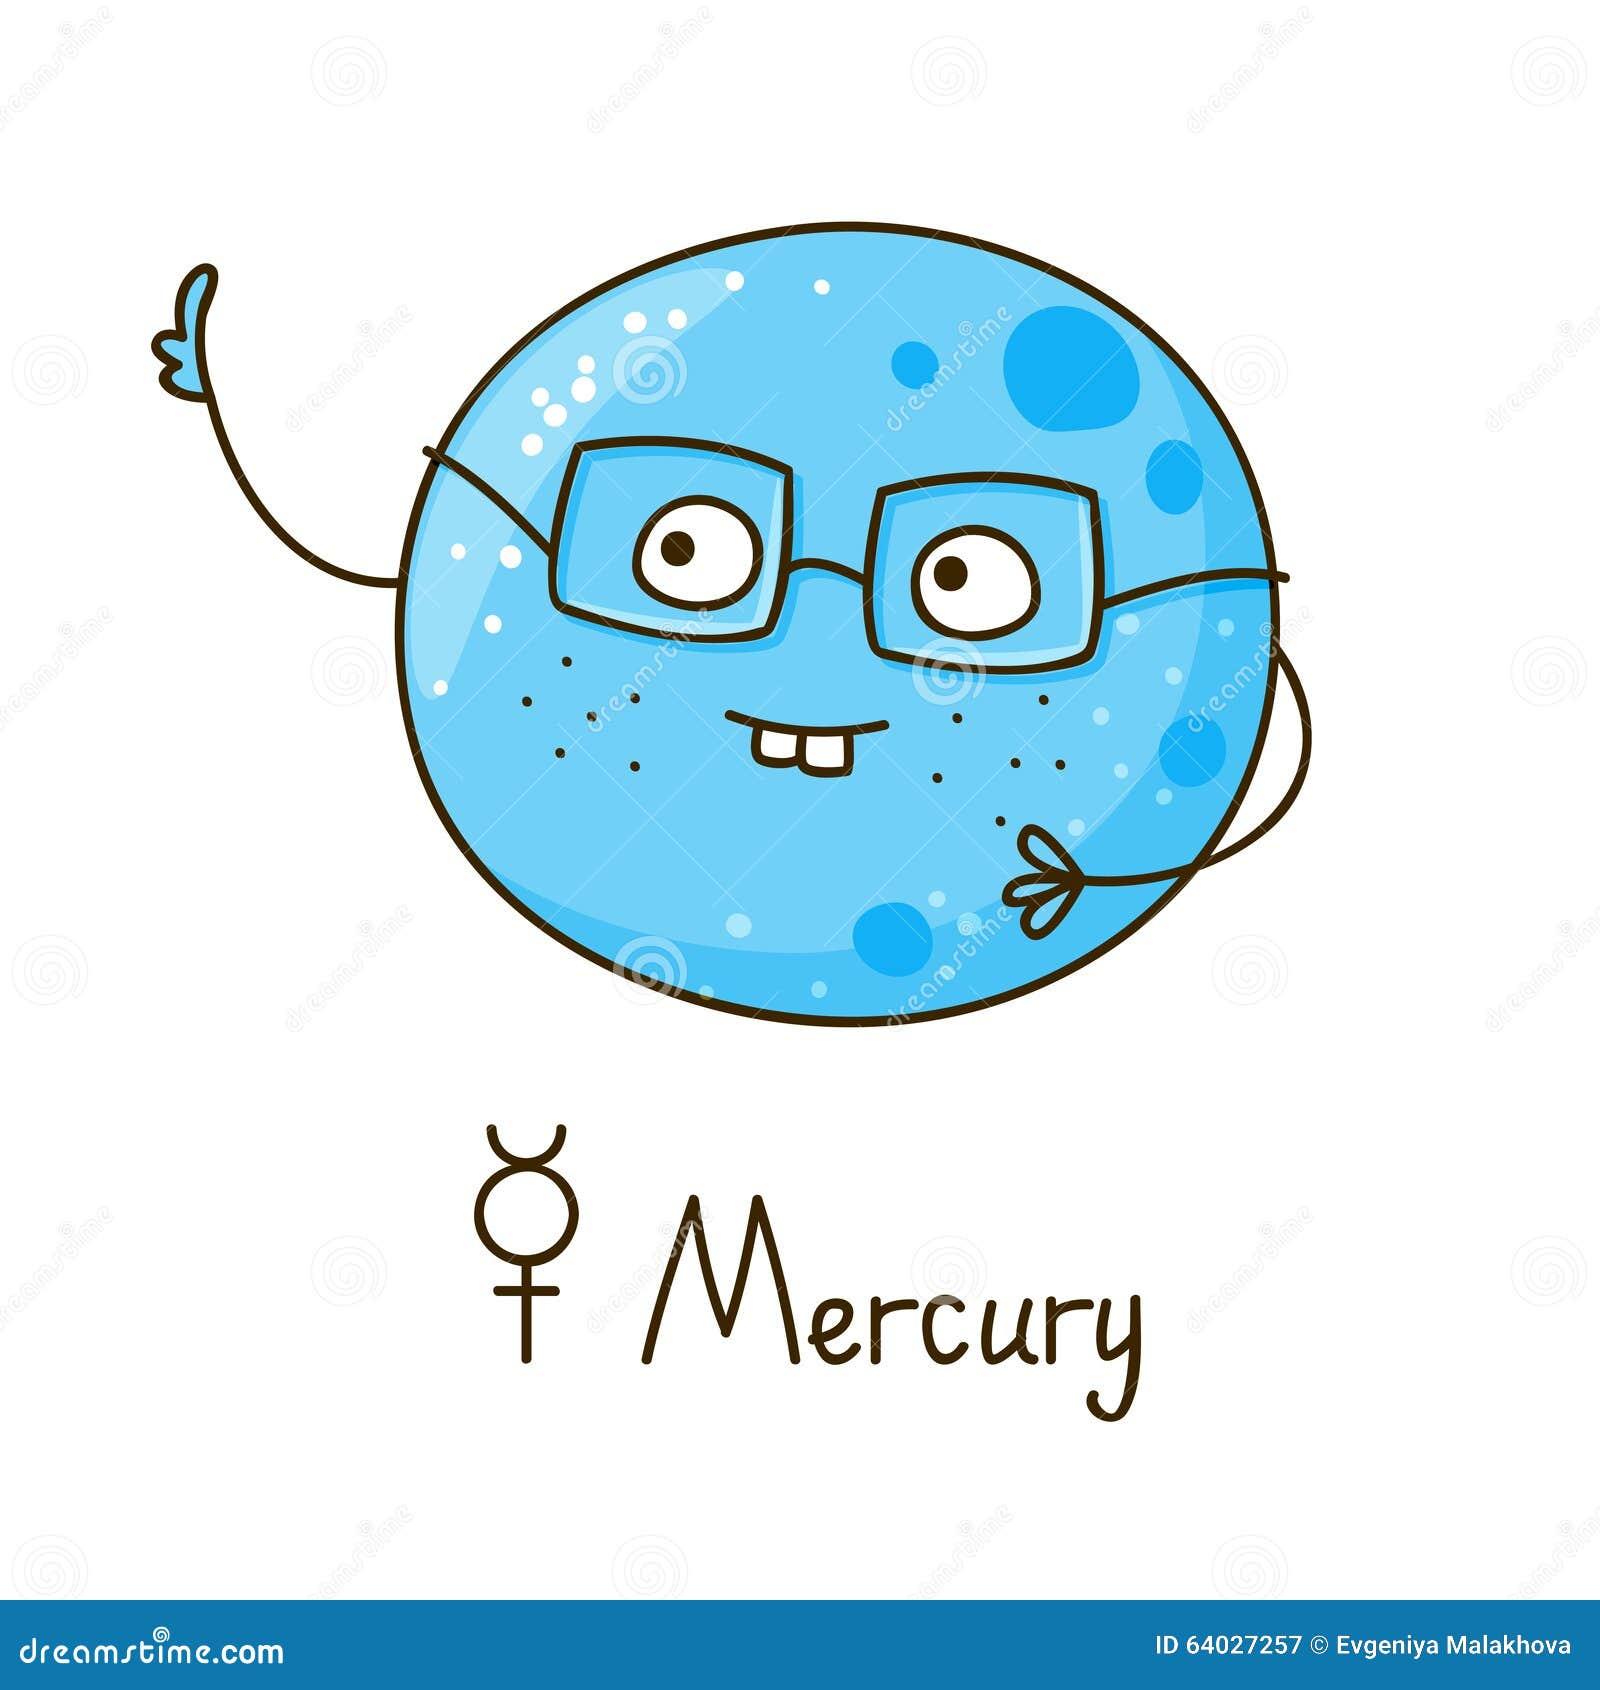 Cute Cartoon Mercury Isolated Stock Vector - Image: 64027257